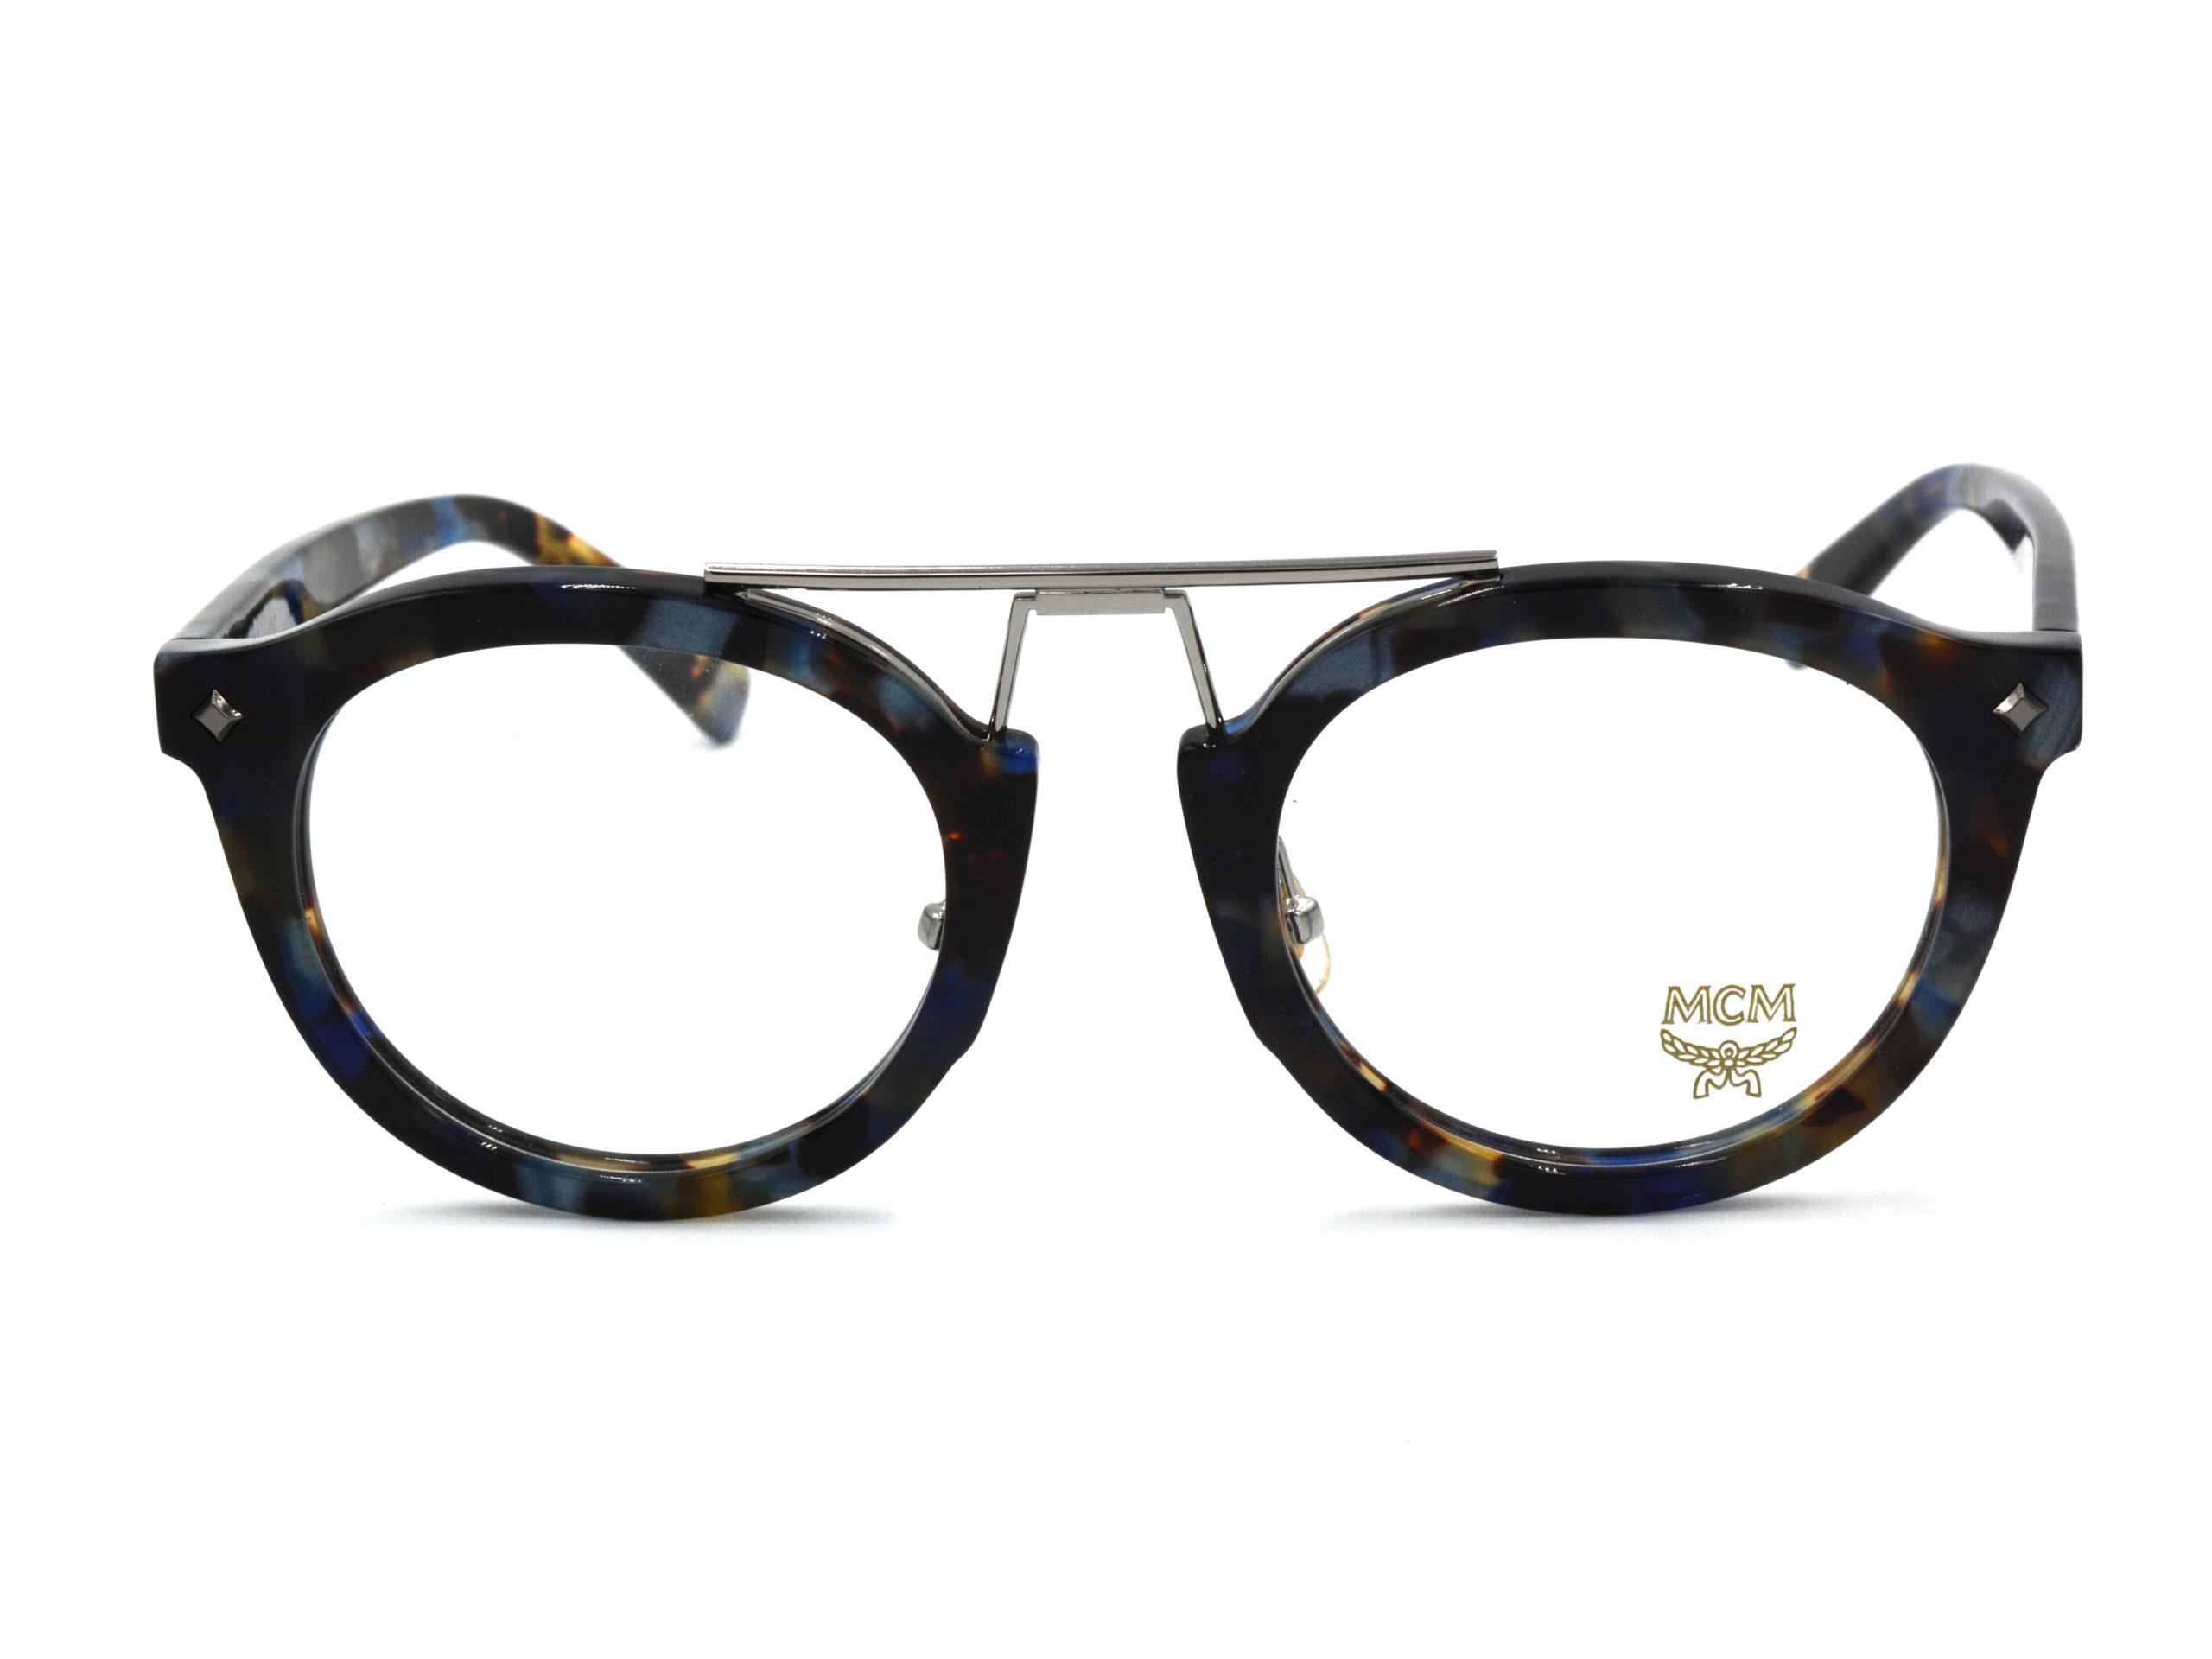 Prescription Glasses MCM 2642 235 49-22-140 Piraeus